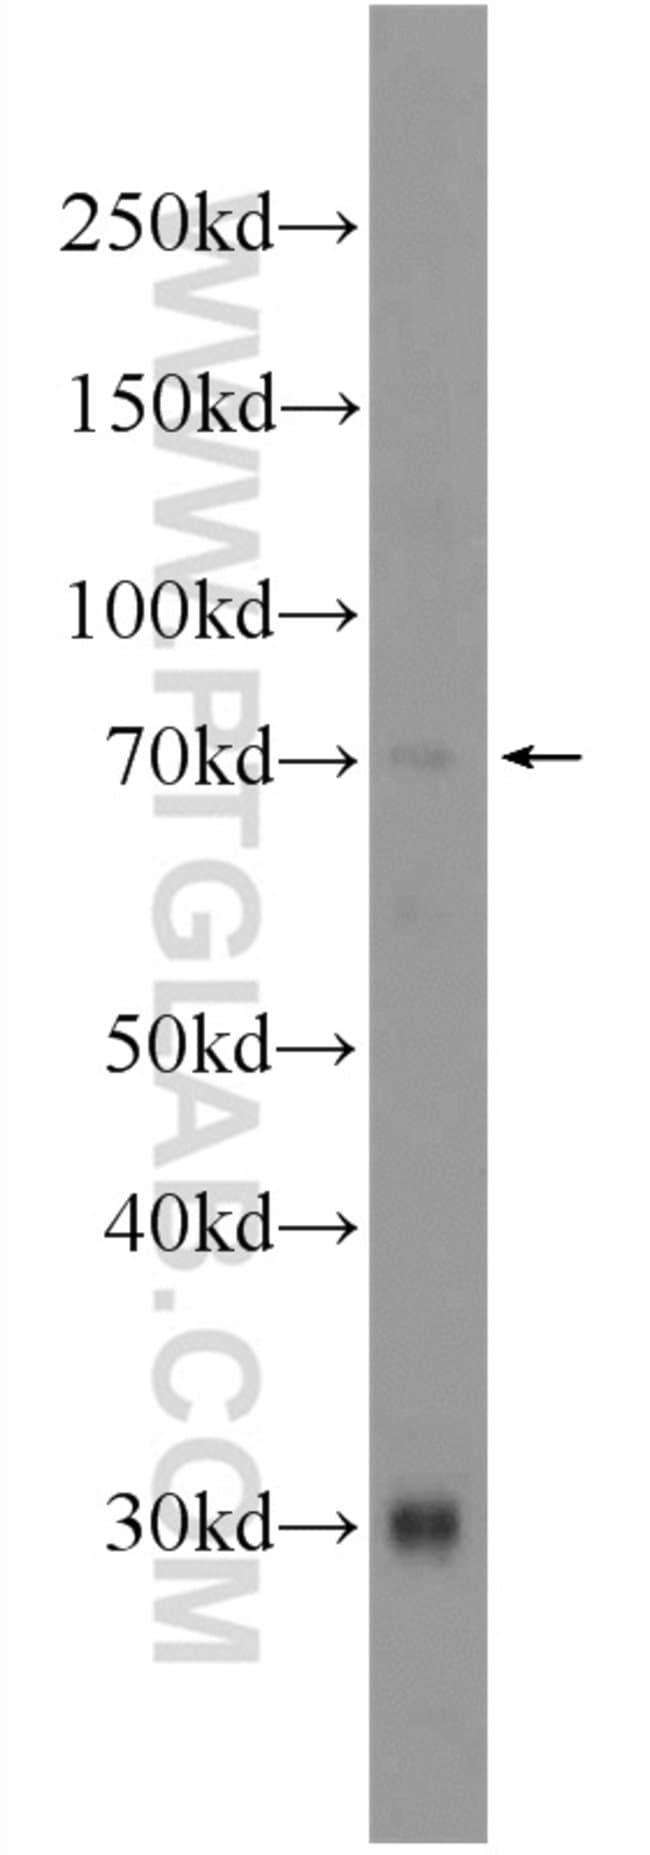 ATG16L2 Rabbit anti-Human, Mouse, Polyclonal, Proteintech 150 μL; Unconjugated Ver productos